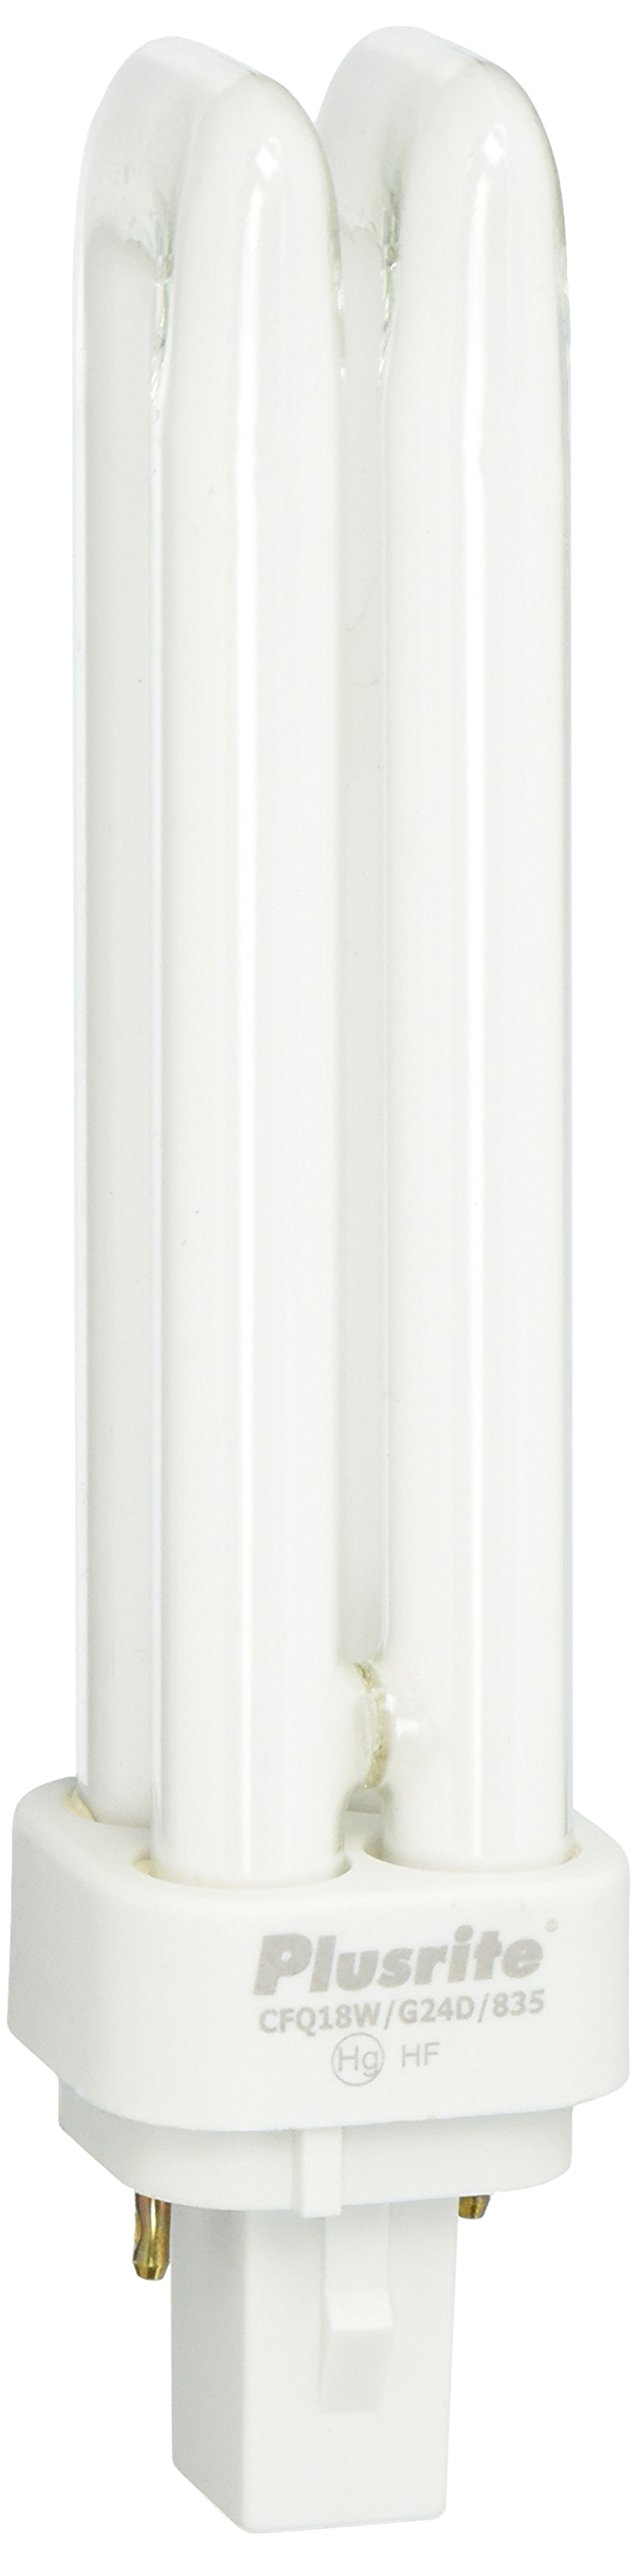 Plusrite 4022 - PL18W/2U/2P/835 Double Tube 2 Pin Base Compact Fluorescent Light Bulb